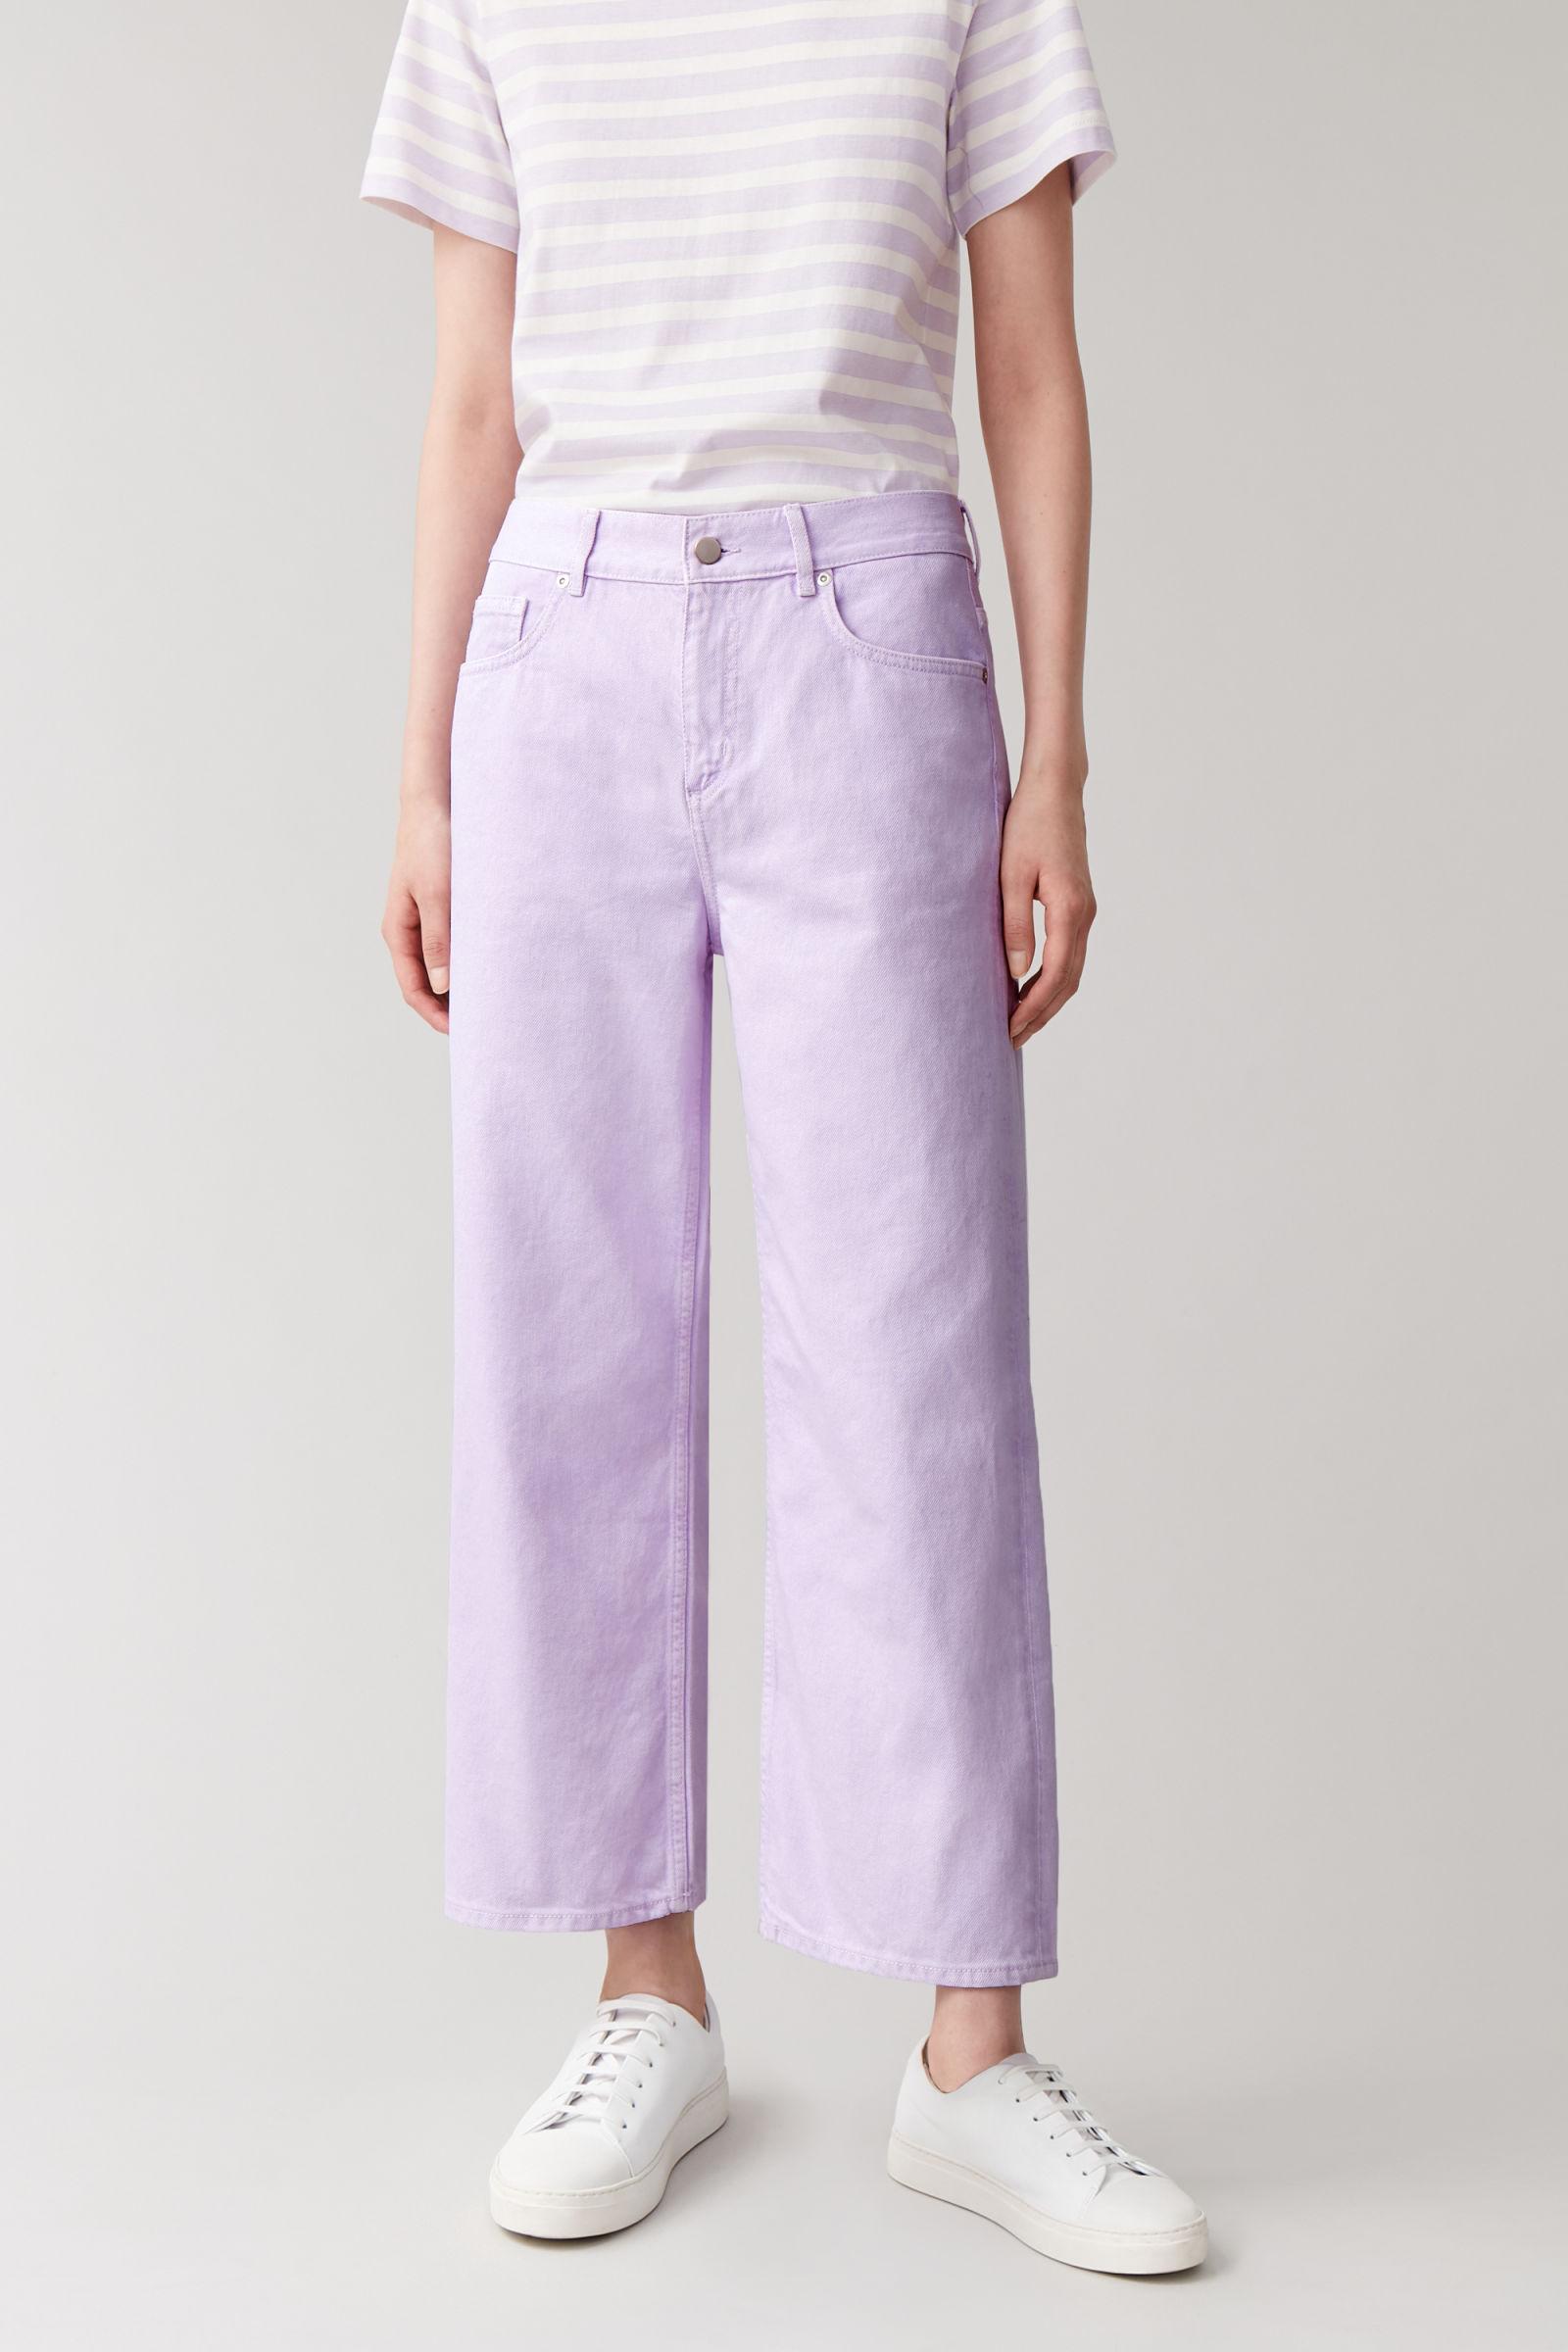 Lilla denim bukser. (Foto: PR)